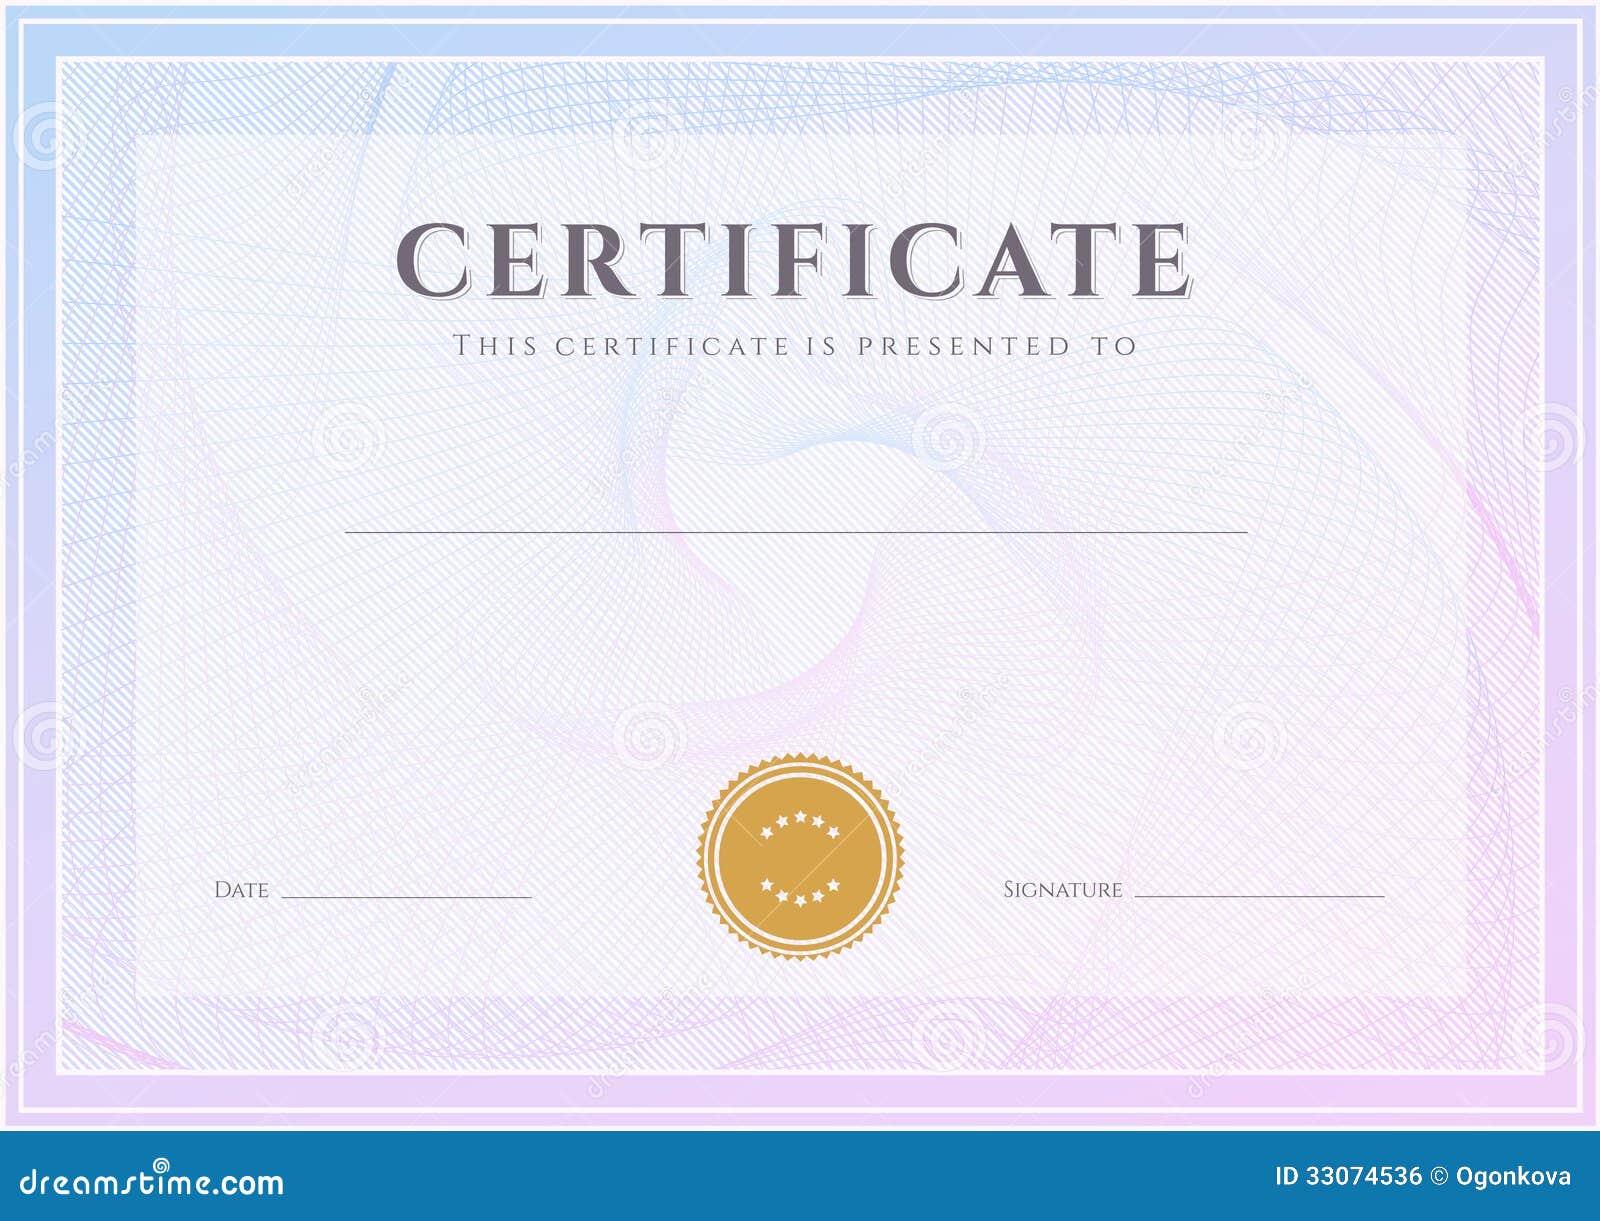 Сертификат шаблон диплома Картина награды Иллюстрация вектора  Сертификат шаблон диплома Картина награды